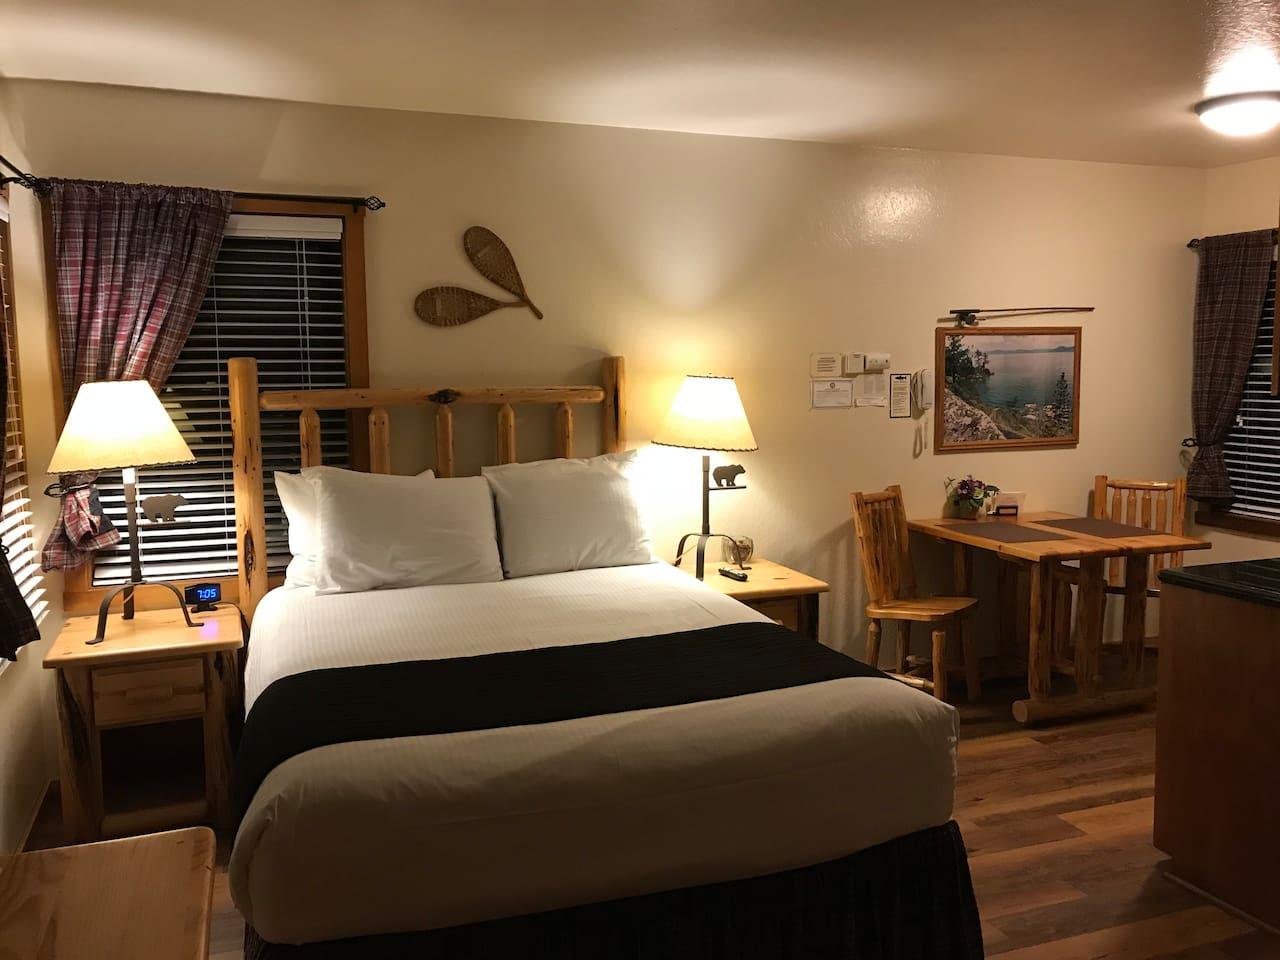 Comfortable condo with rustic decor